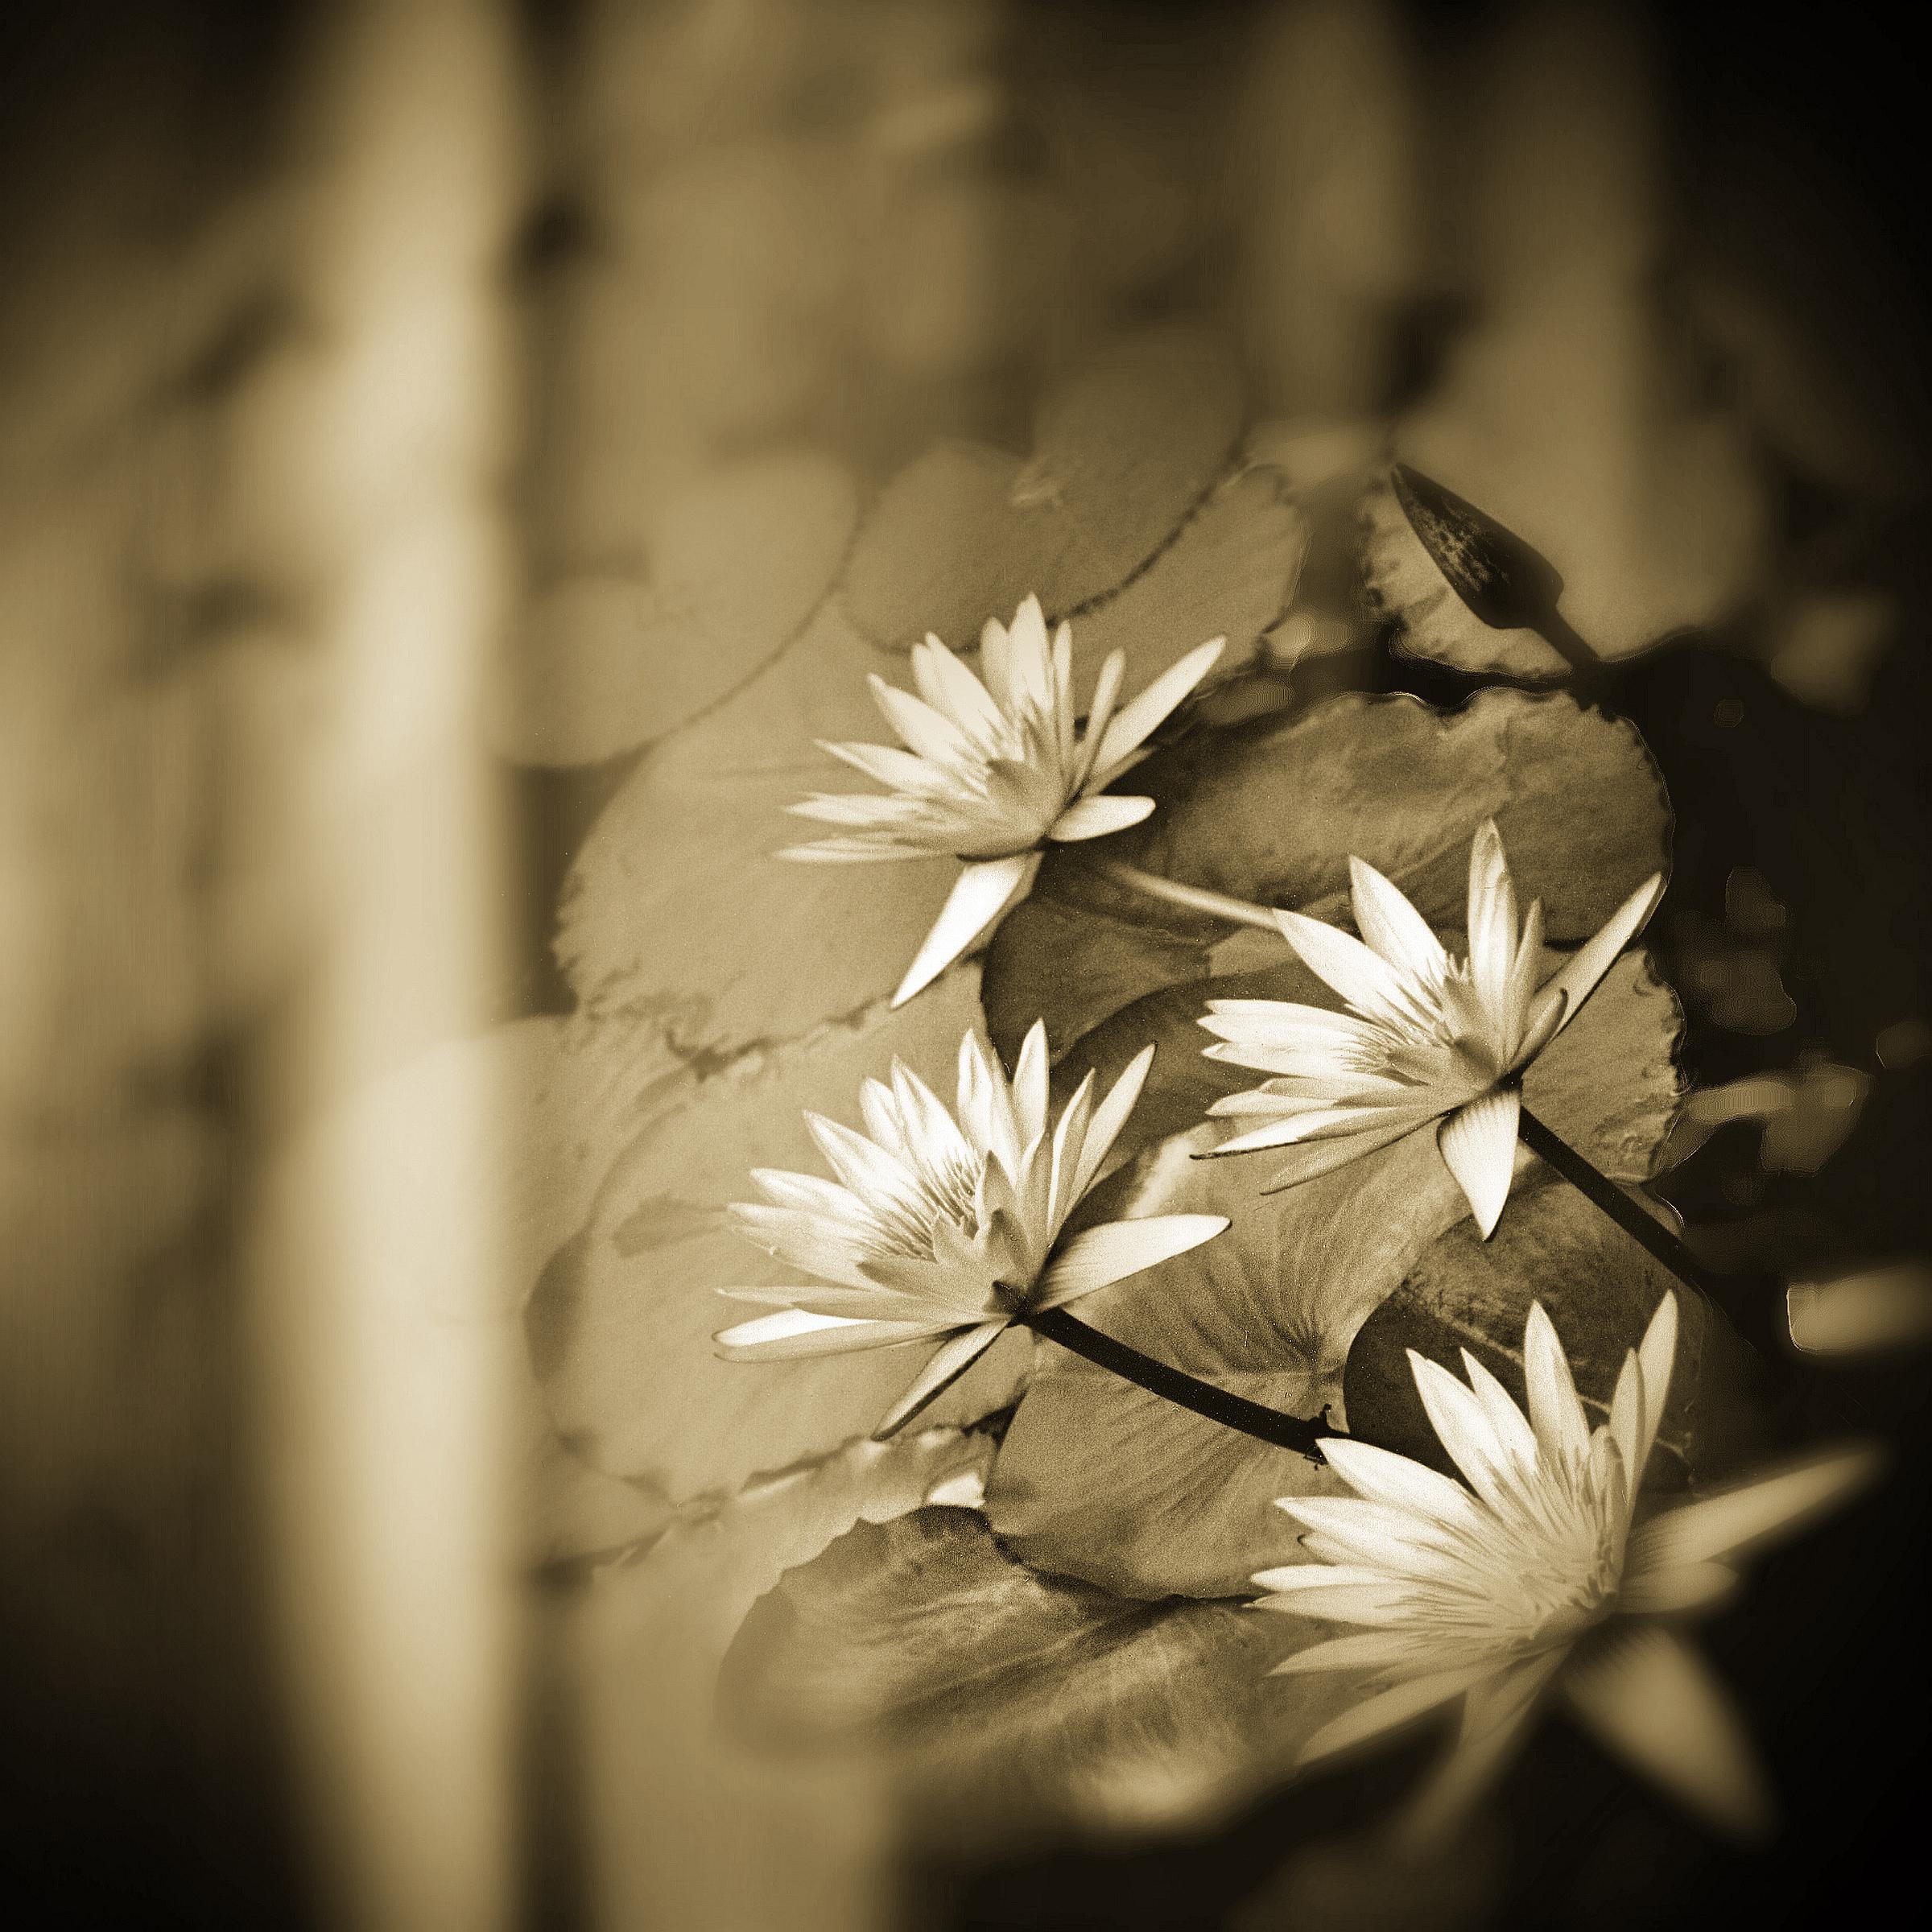 FlowersSquare_c2018_PhotographbyDHDowling.jpg